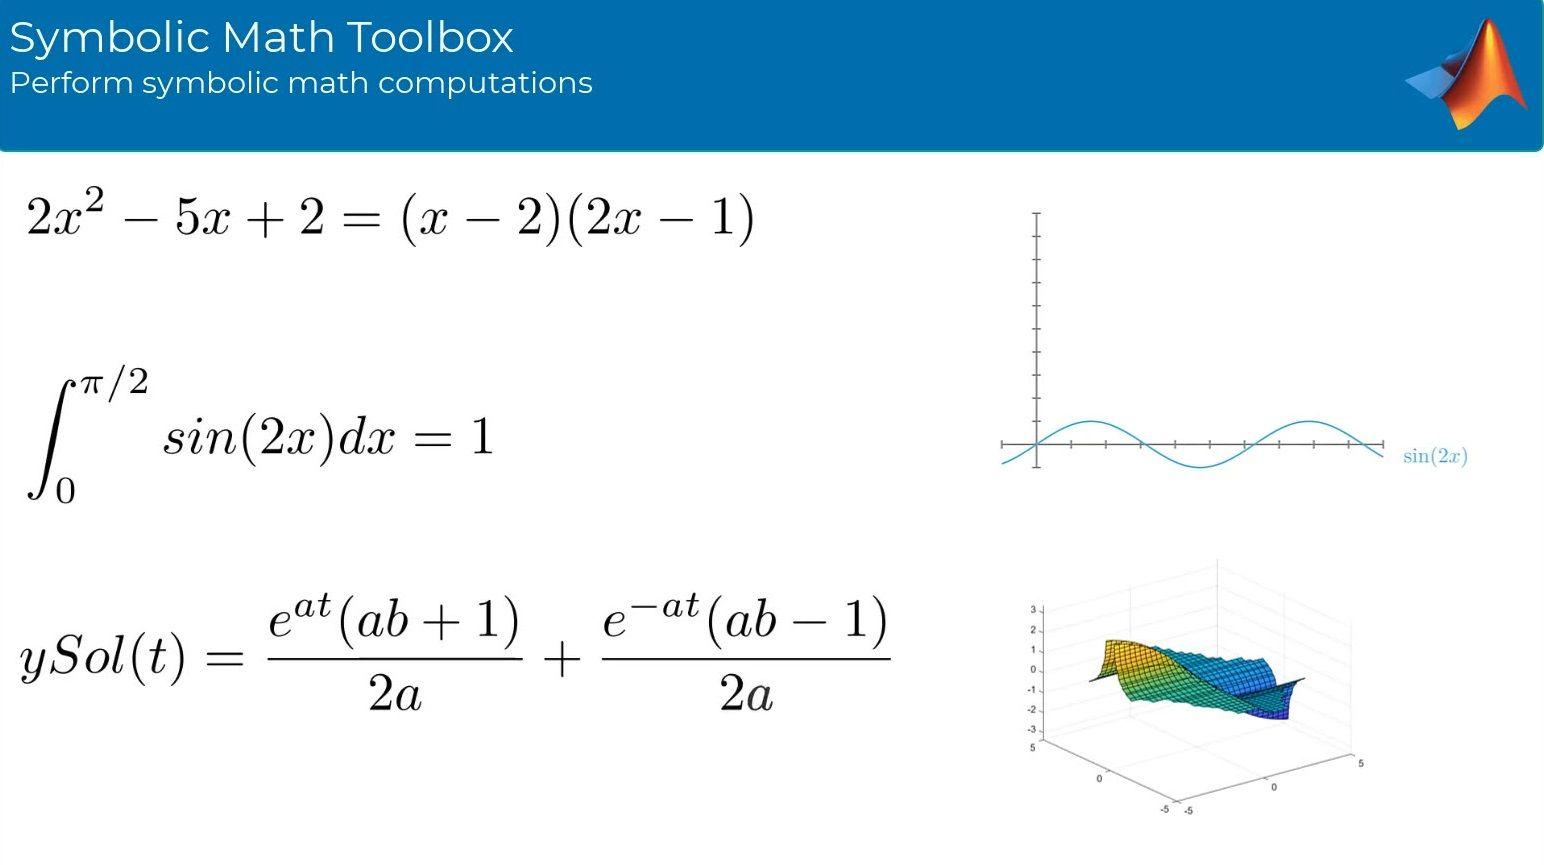 Symbolic Math Toolbox™ を使用して数式処理と可変精度演算を使用した数学演算を実行します。